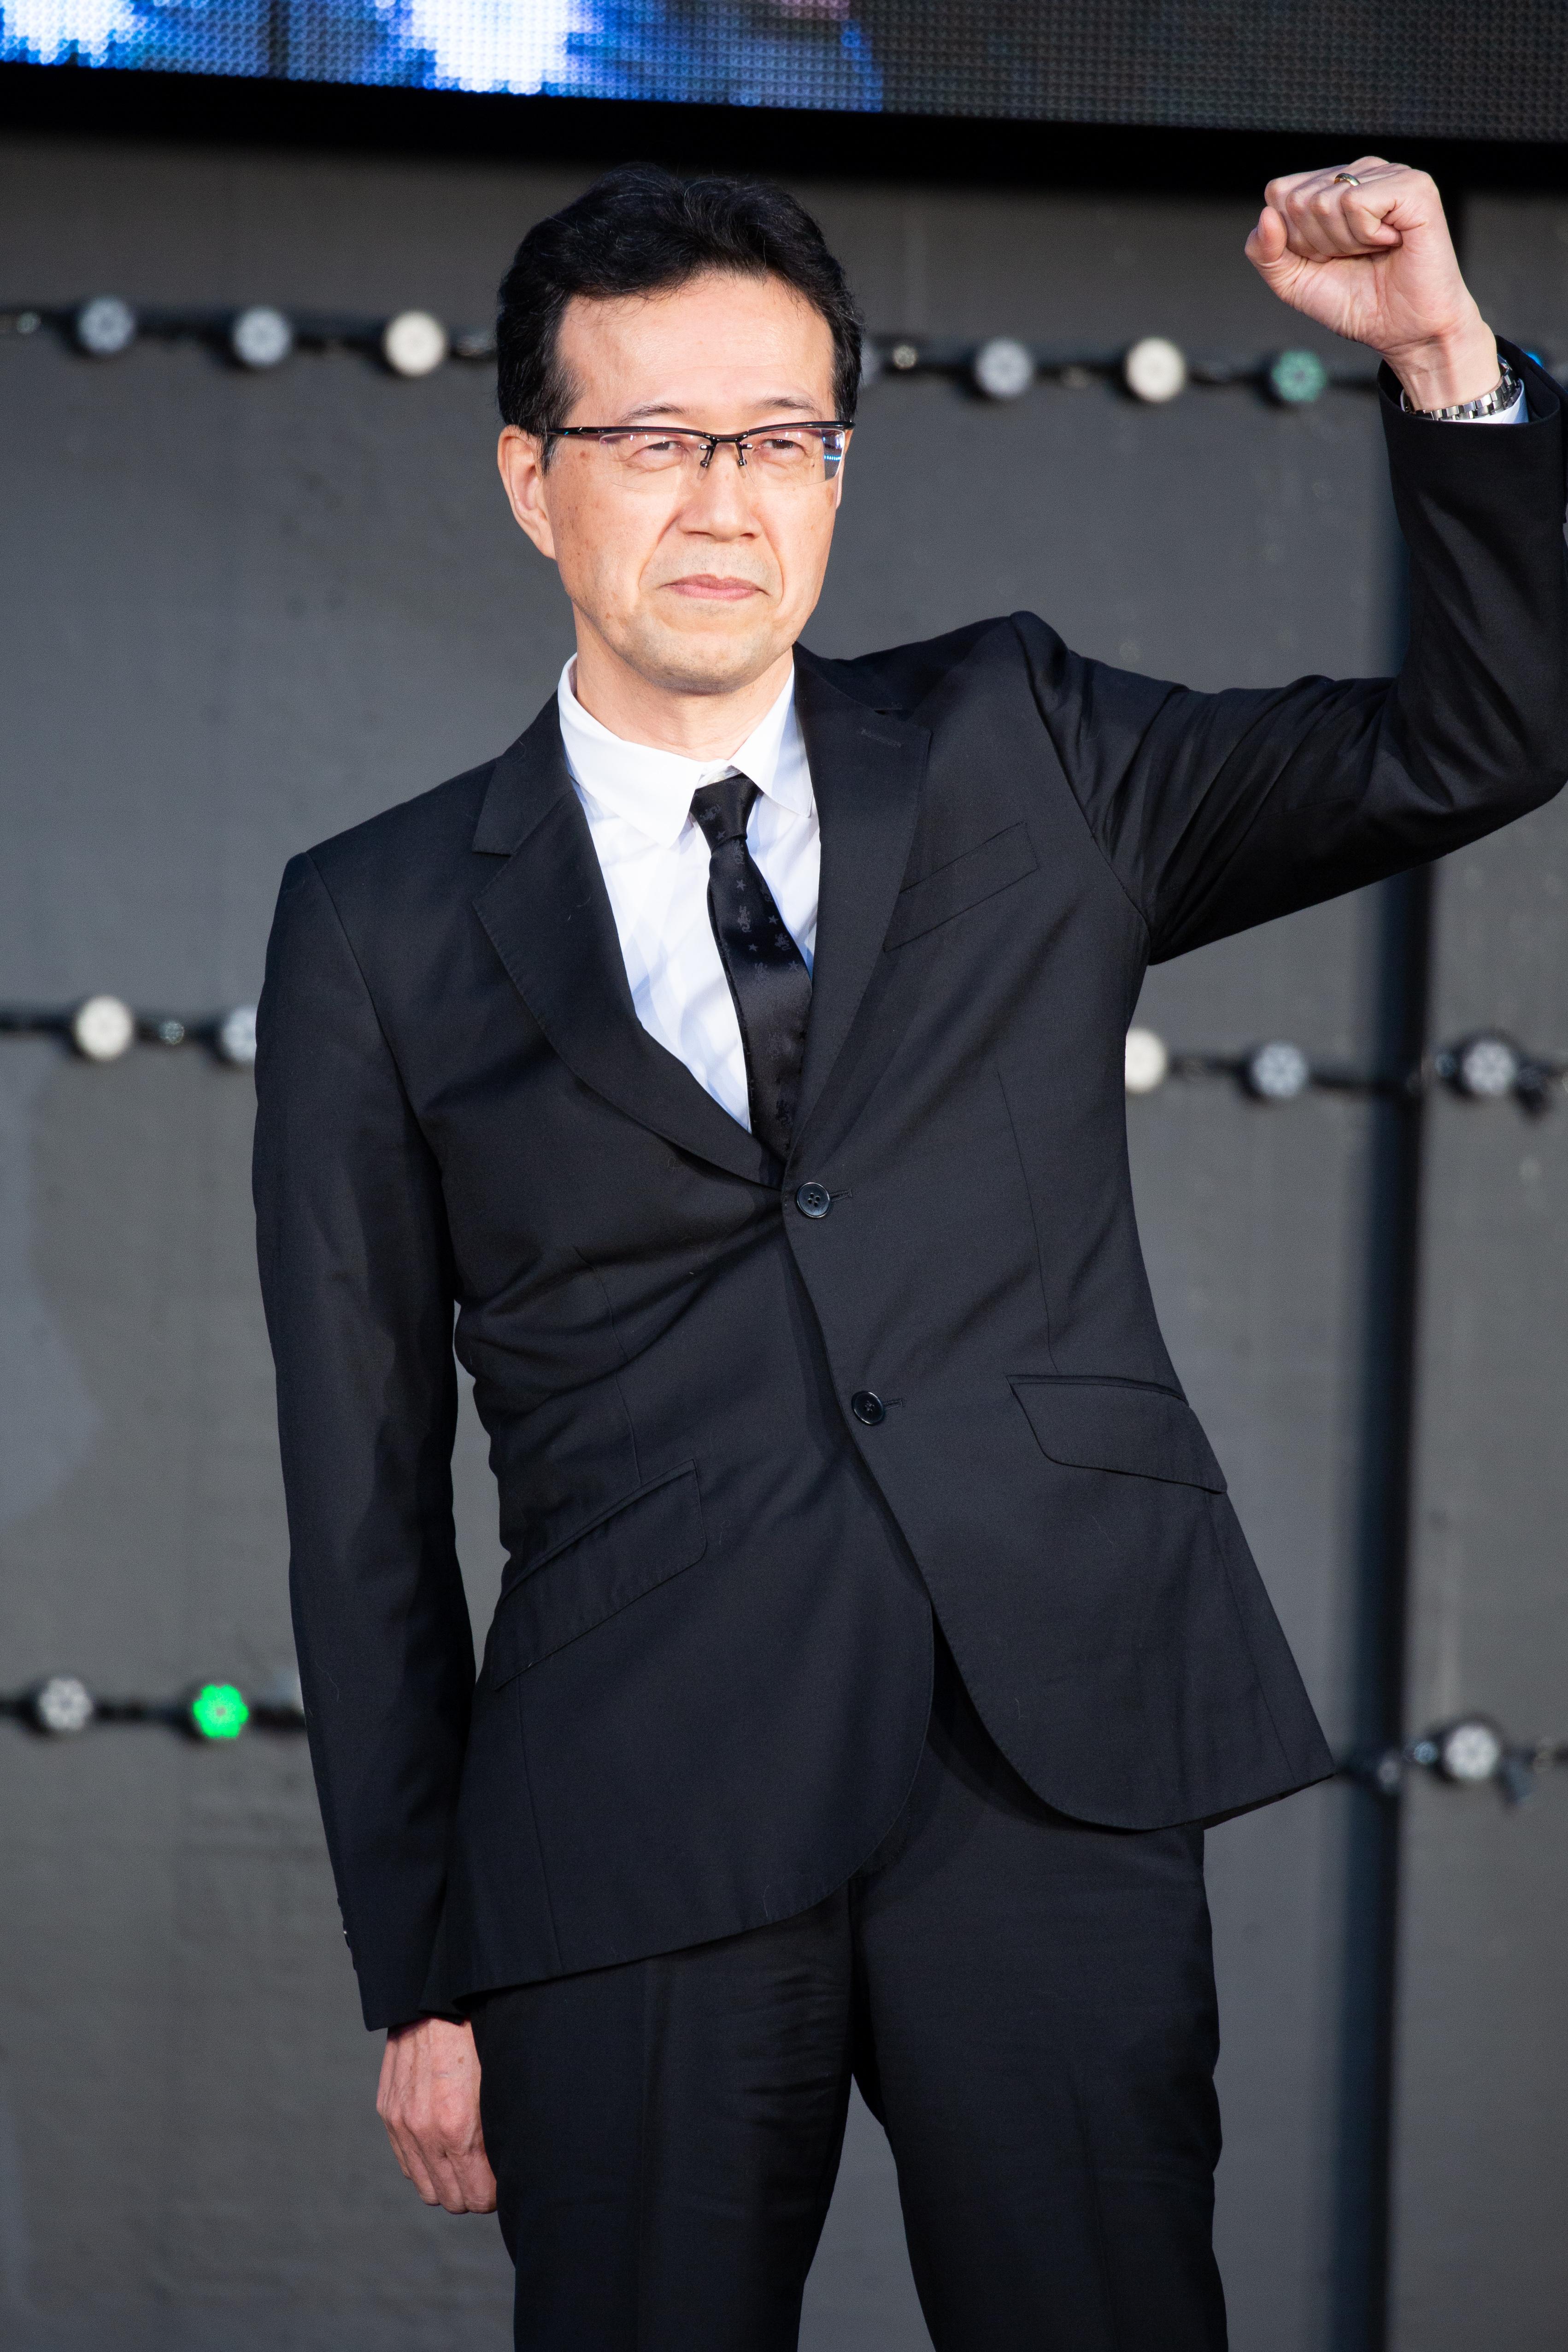 Photo Shinji Aramaki via Opendata BNF